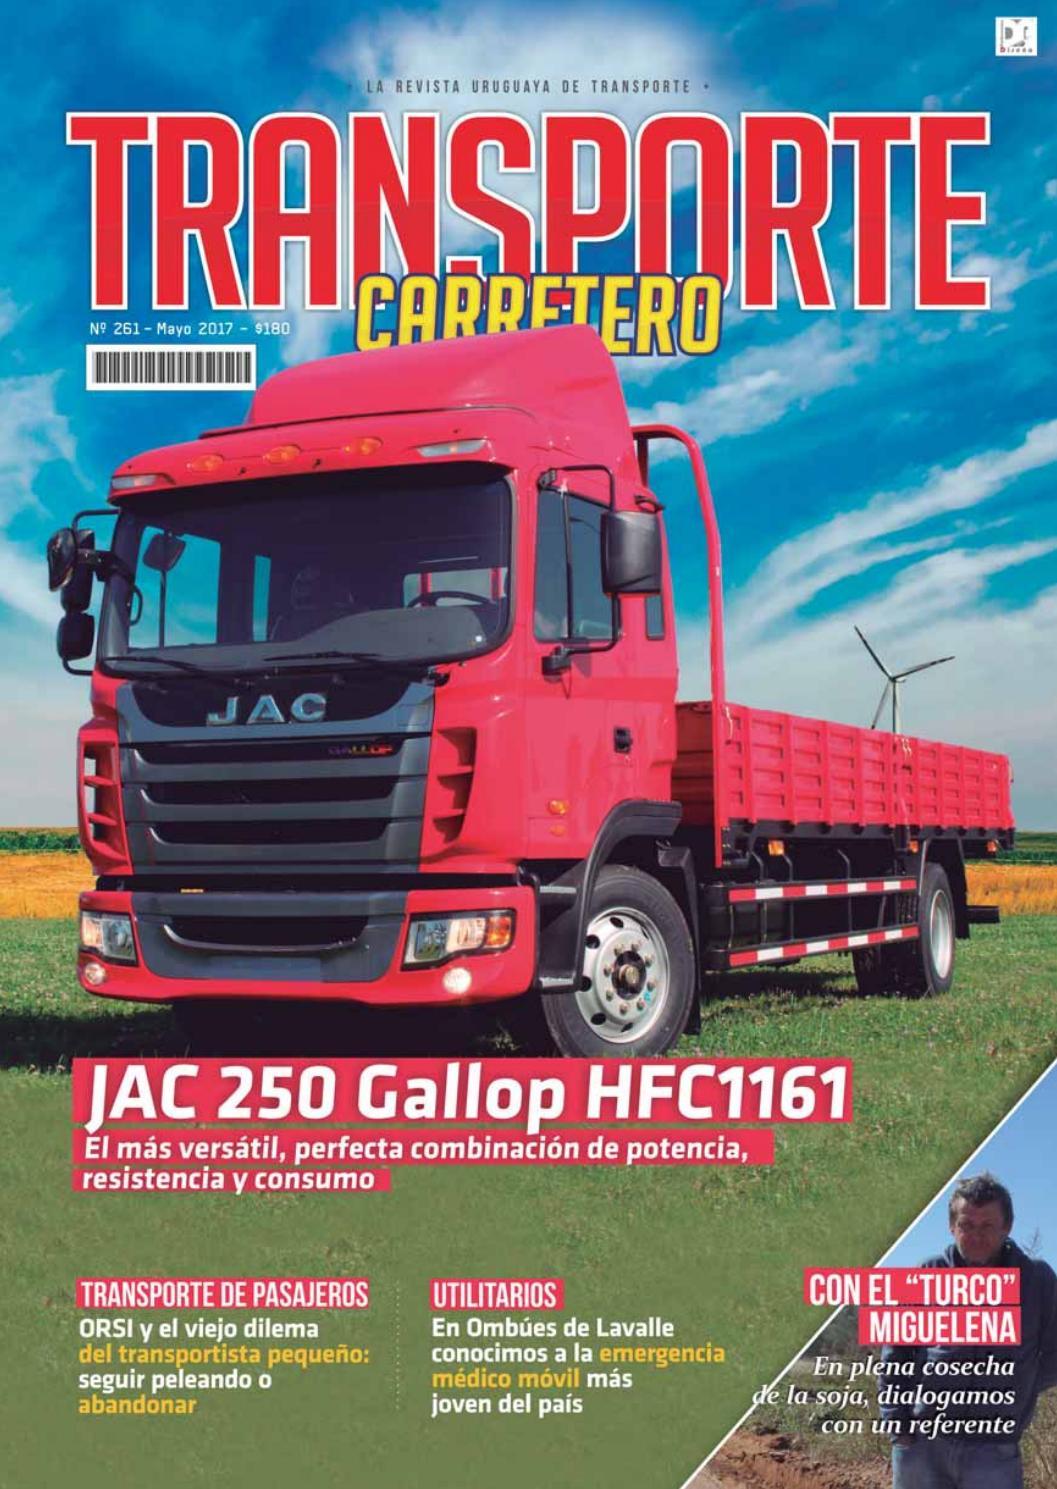 Transporte Carretero Nº 261 - mayo 2017 by Diseño Producciones - issuu